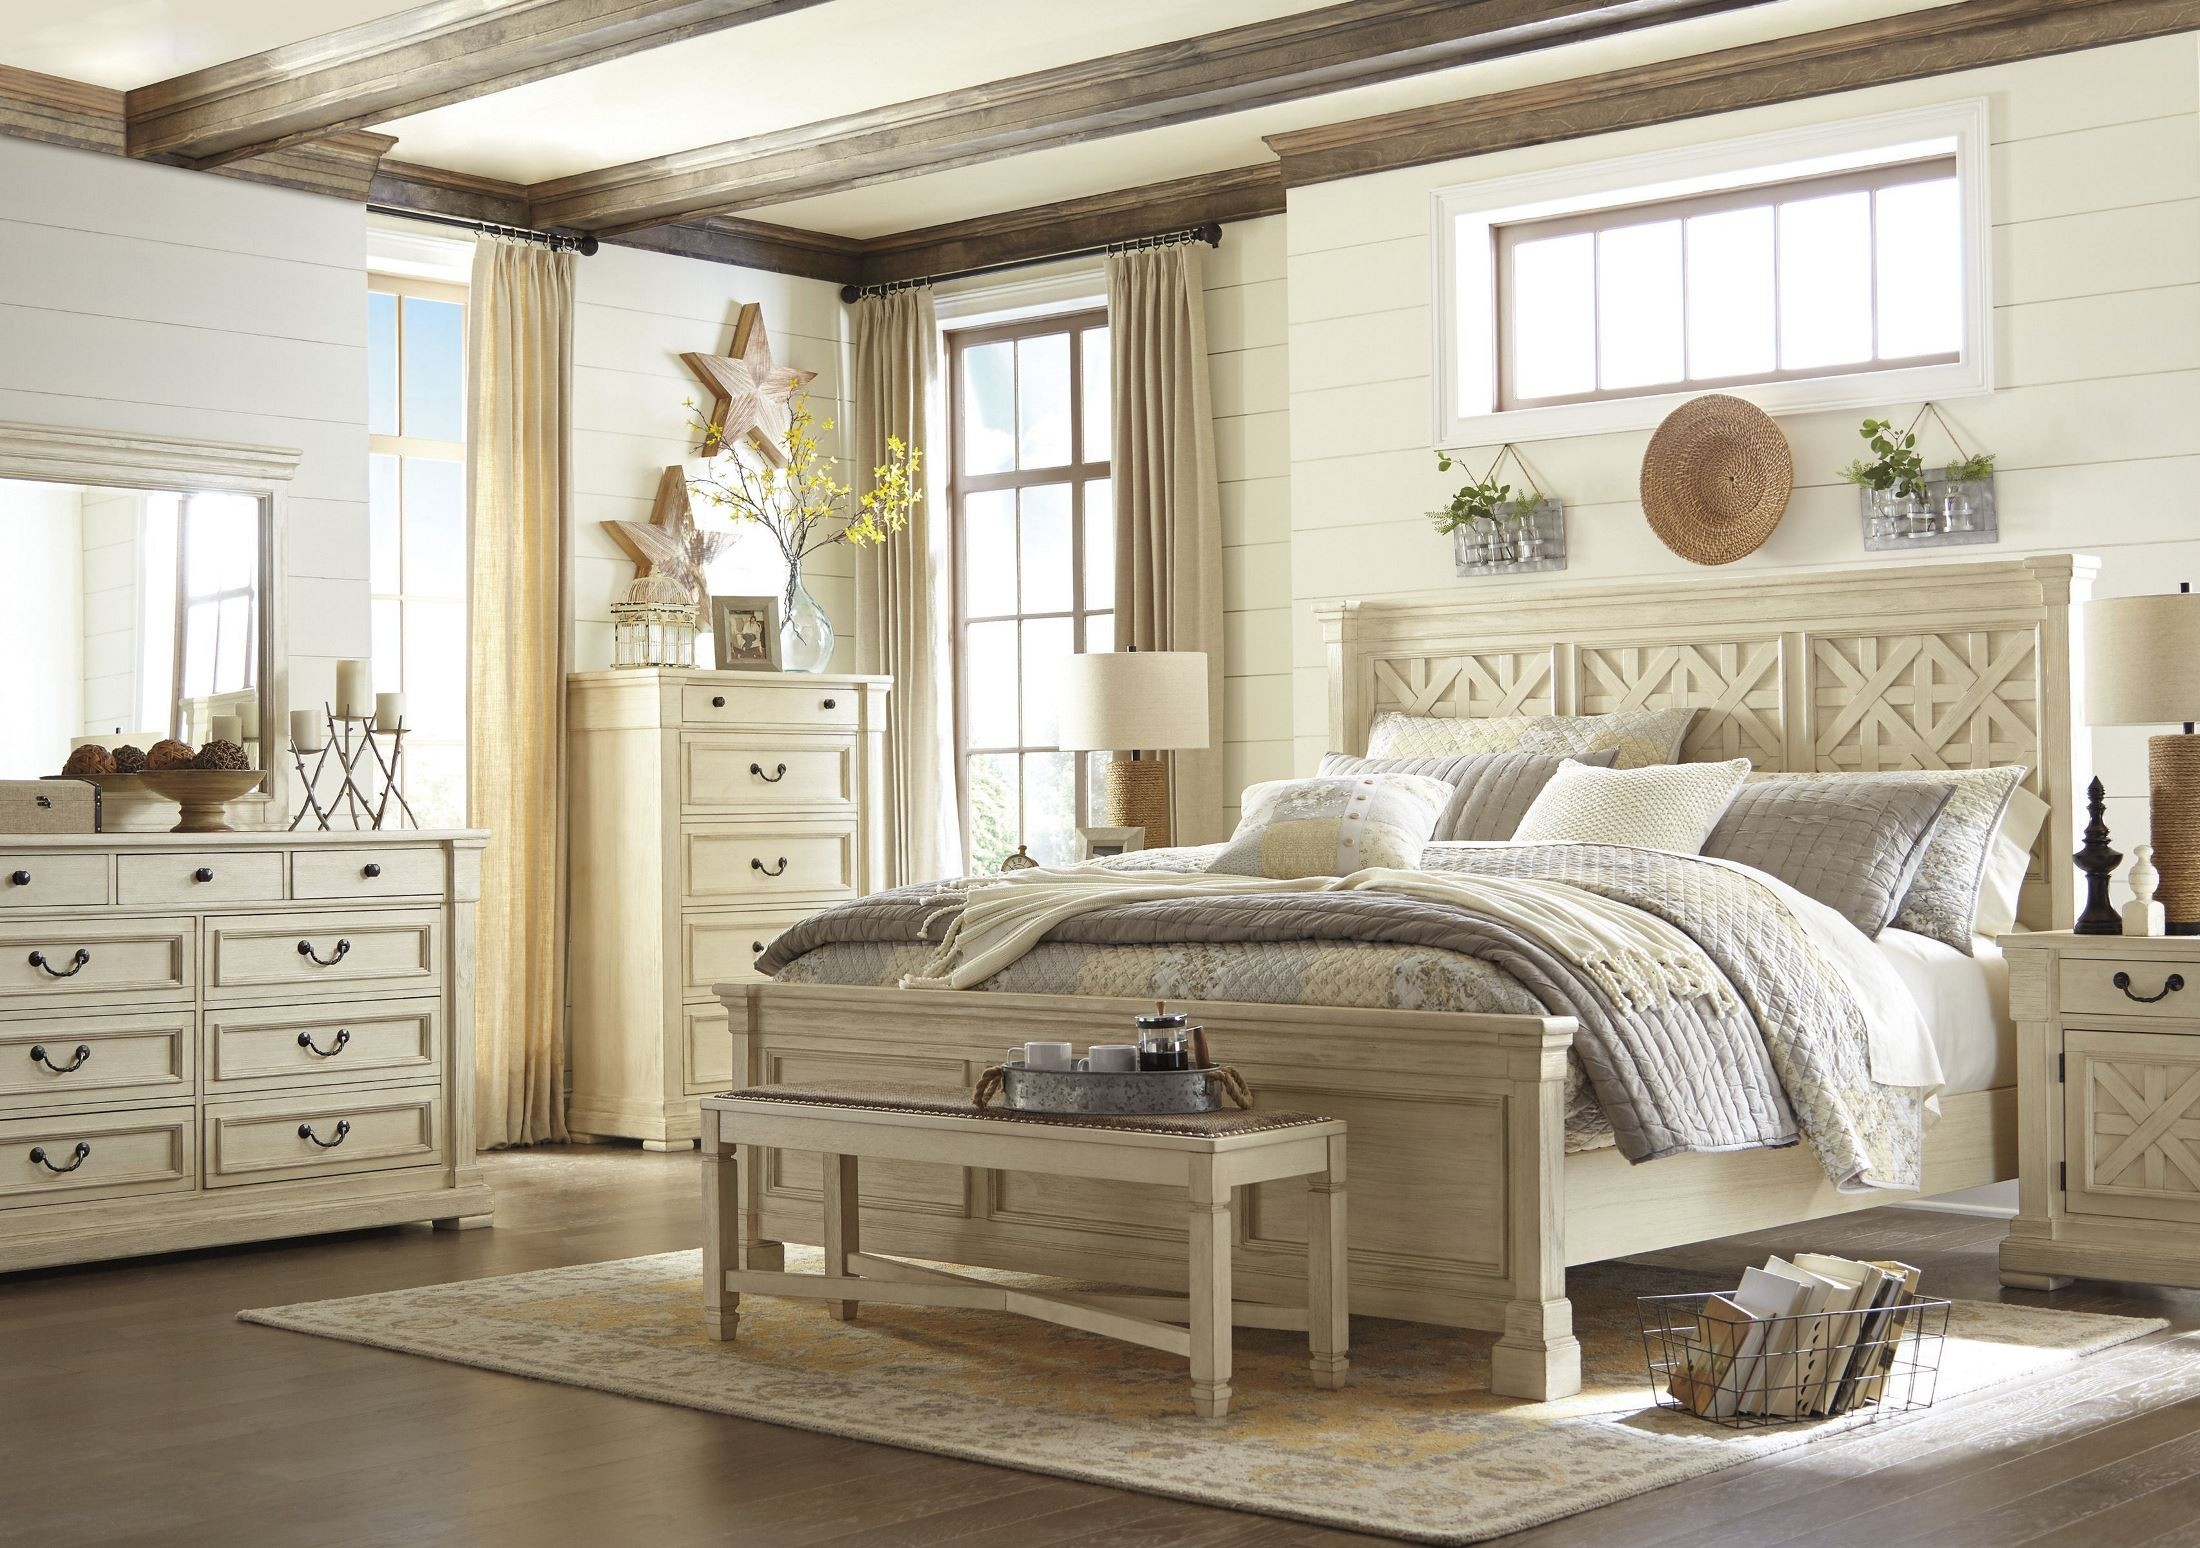 Bolanburg white louvered panel bedroom set b647 54 77 96 - King size bedroom sets for sale by owner ...